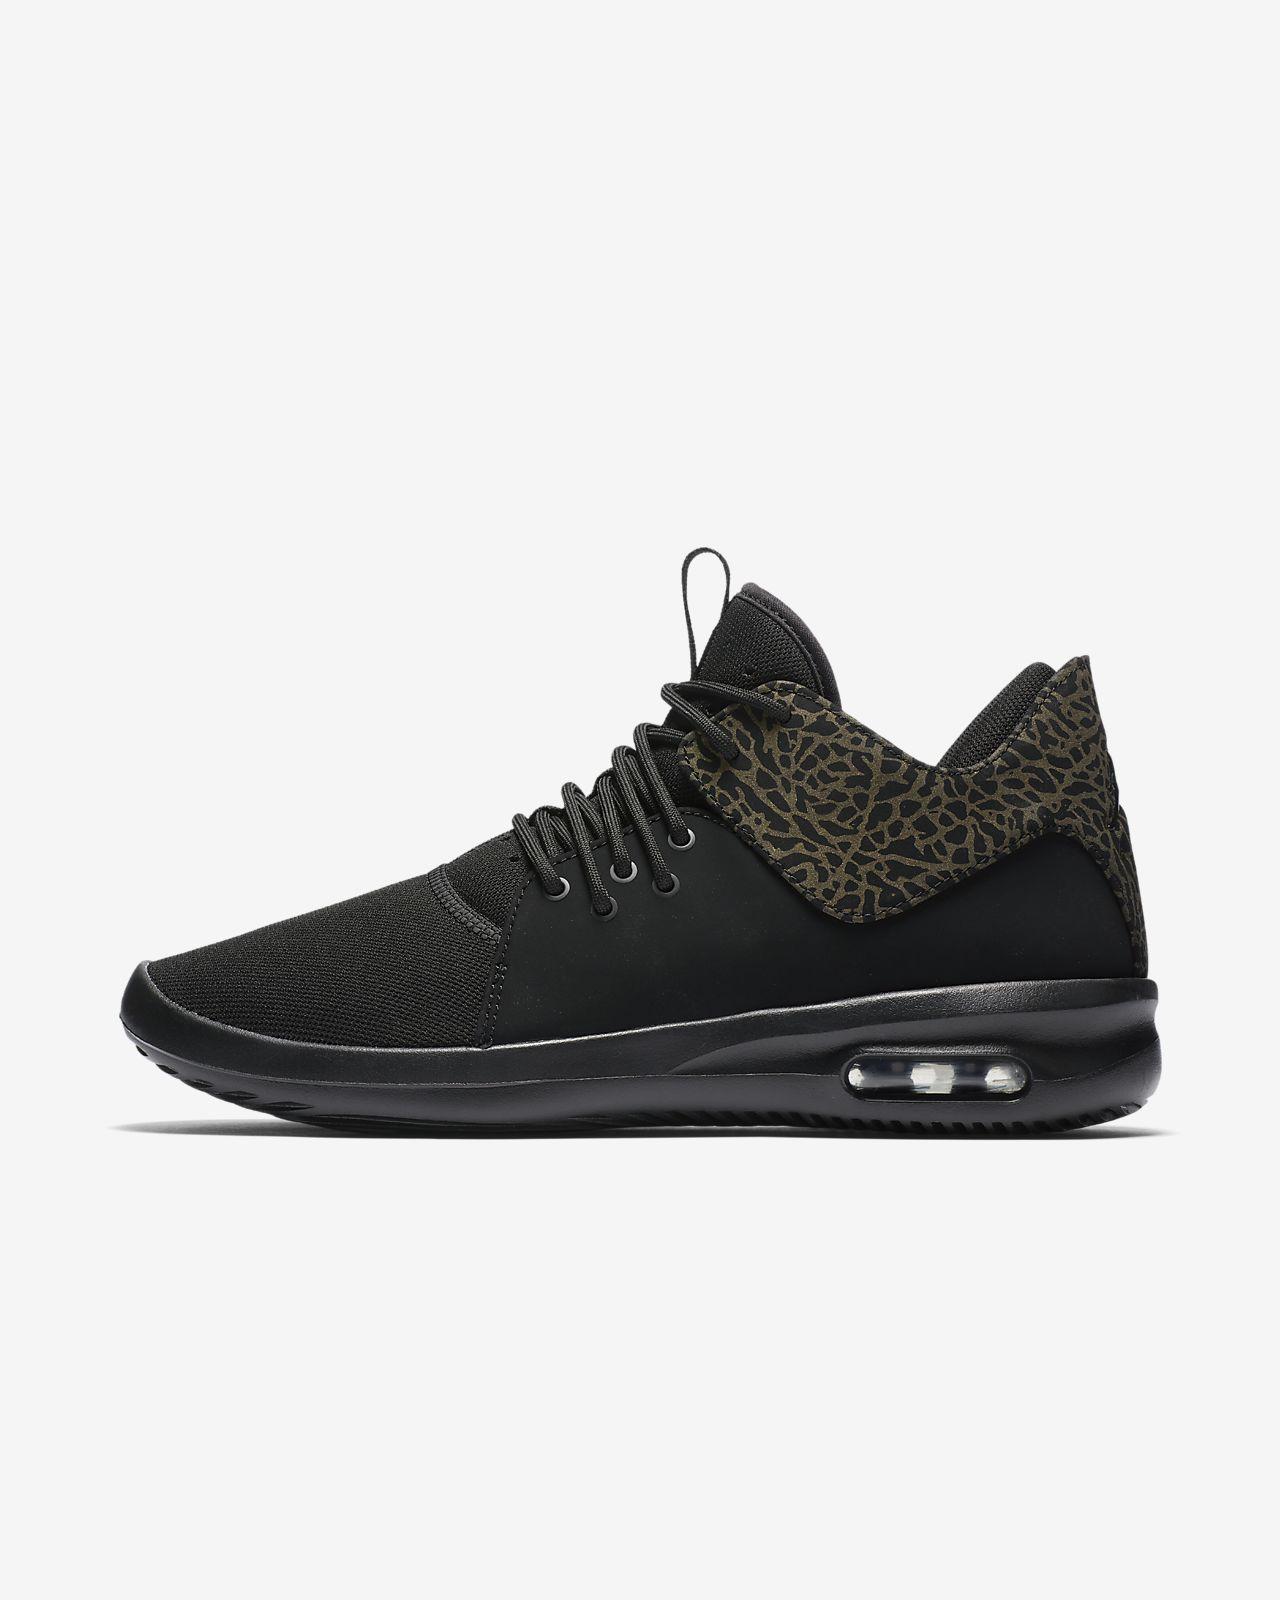 Nike Air Jordan First Class Black/White AJ Mens Lifestyle All NEW